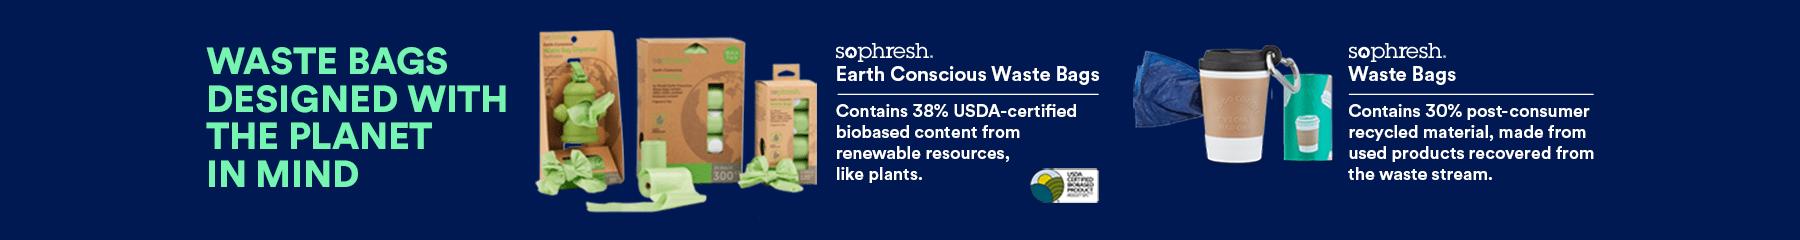 sophresh-waste